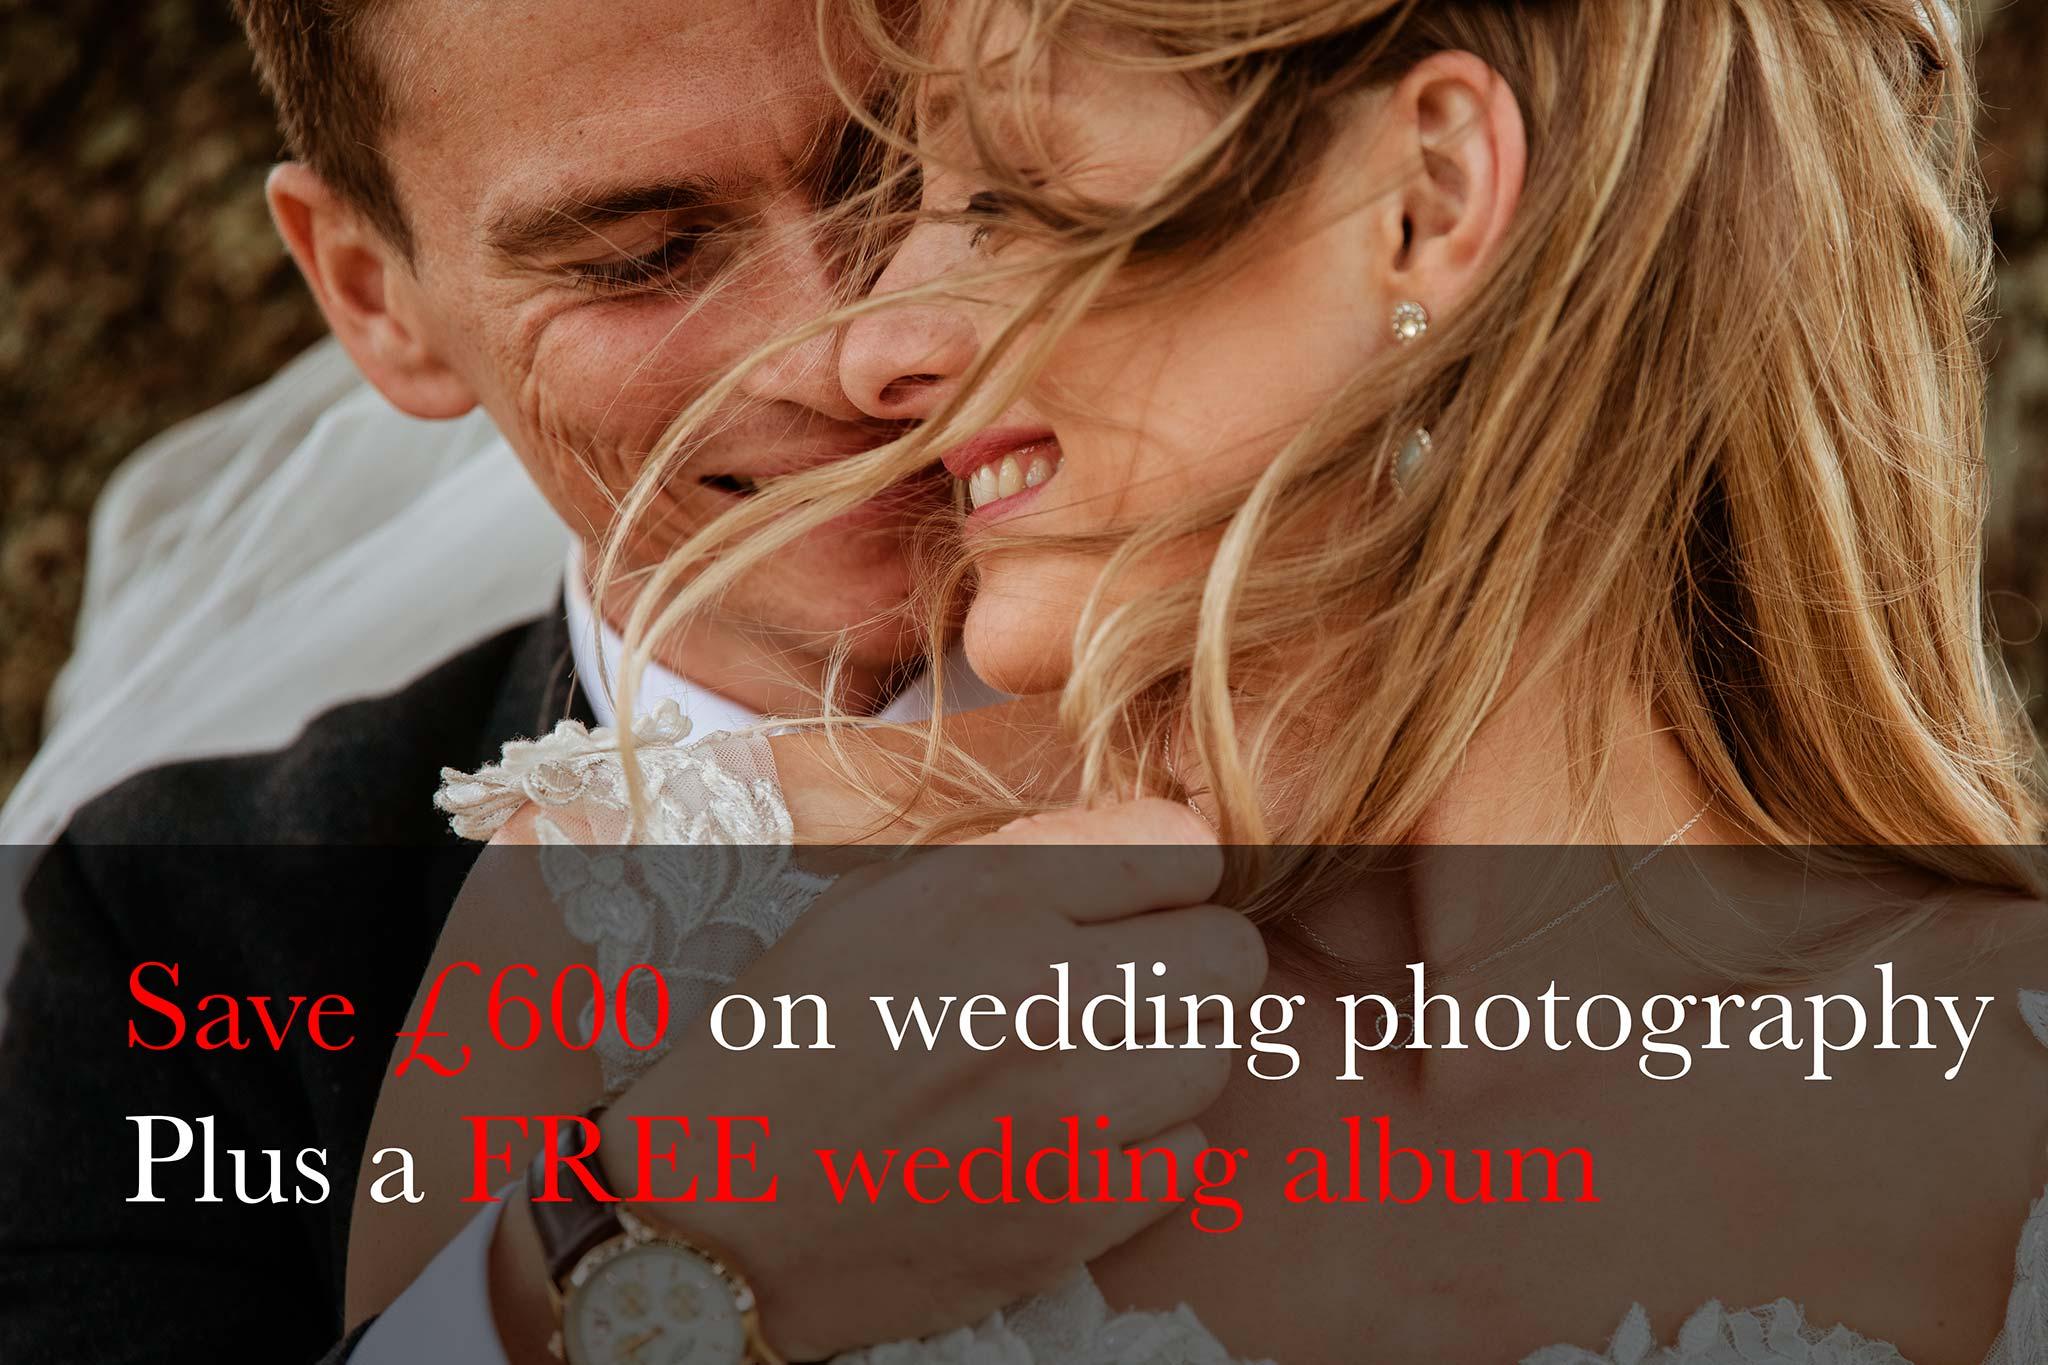 Wedding Photography Offer 2018 Christmas